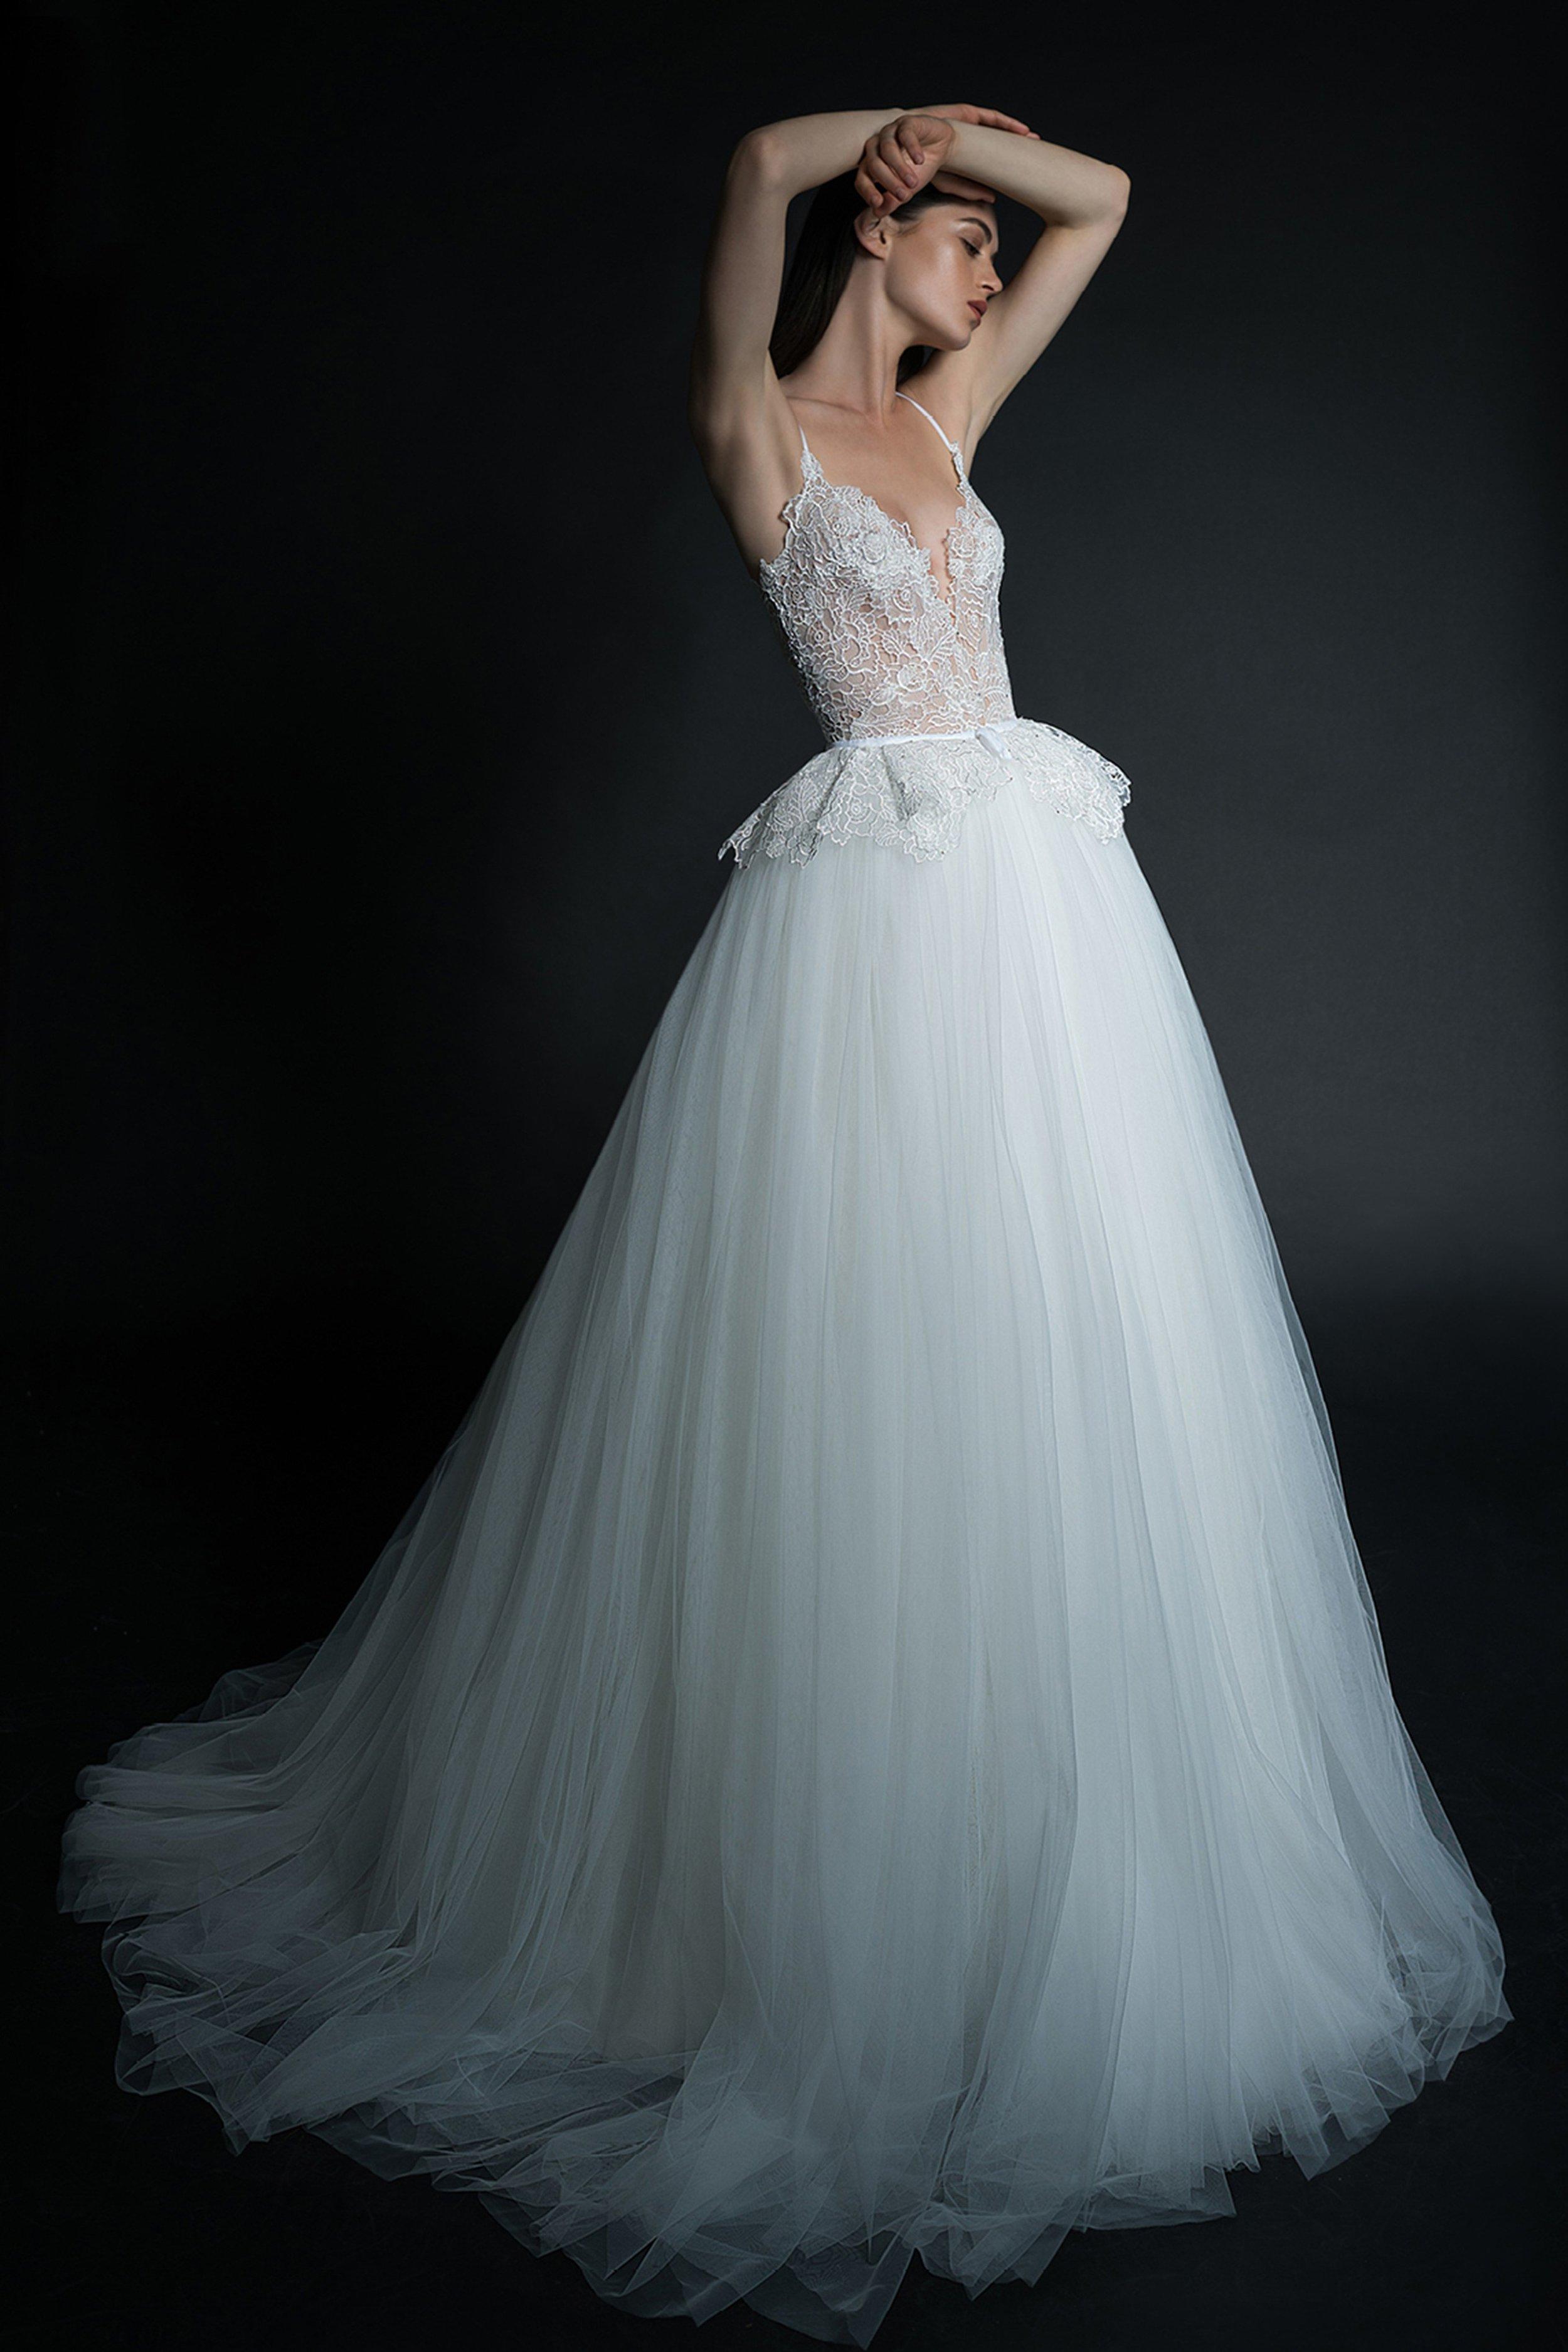 14-inbal-dror-vogue-spring-bridal-2019-pr.jpg